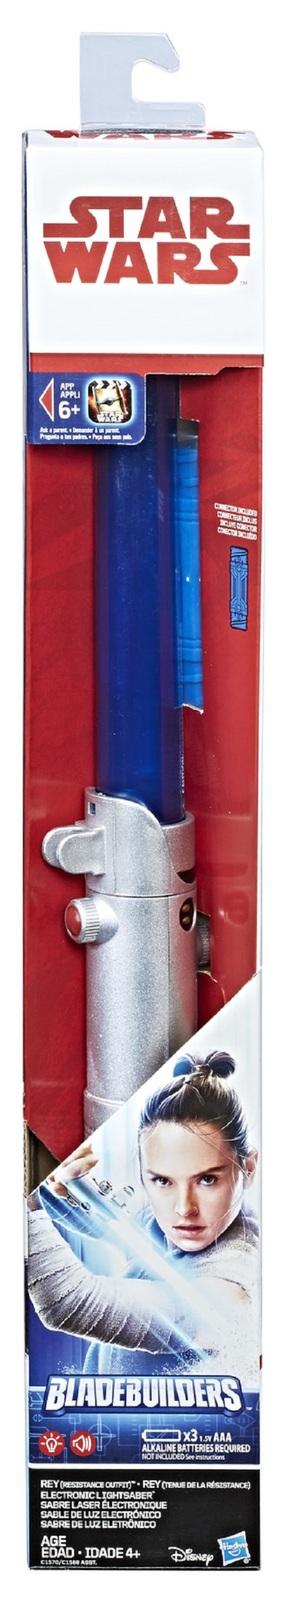 Star Wars: Electronic Lightsaber - Rey image